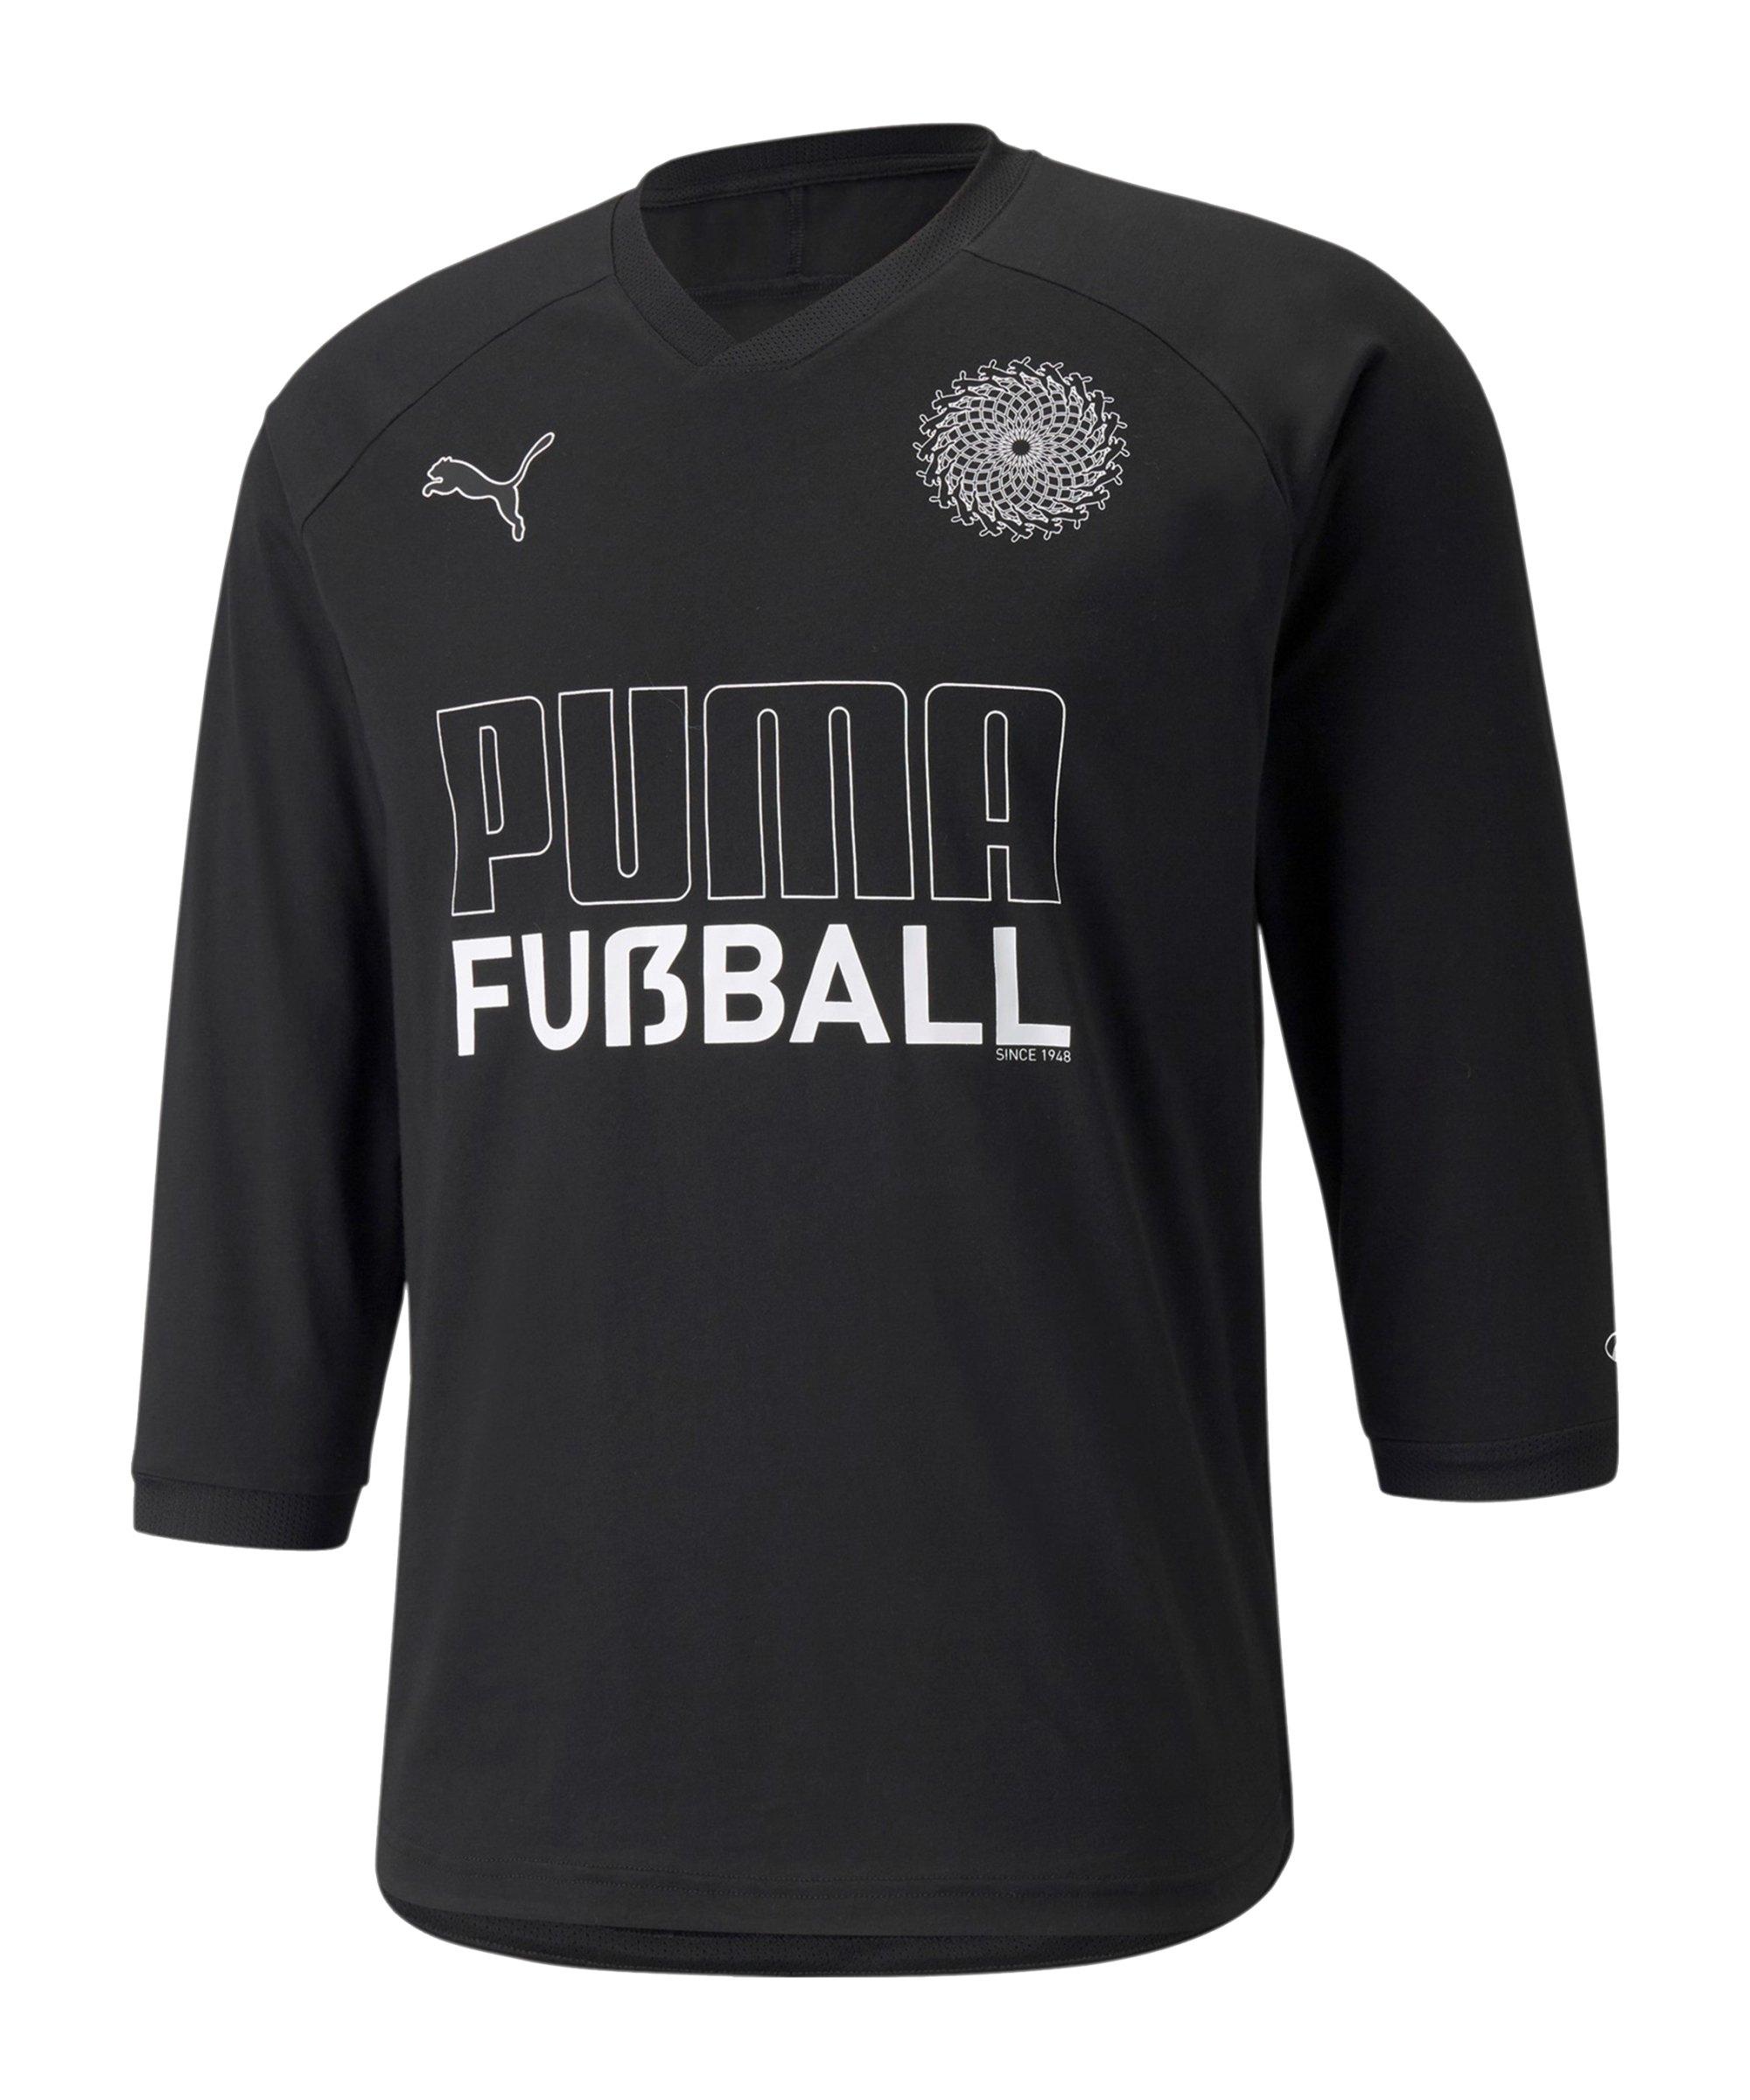 PUMA FUSSBALL KING T-Shirt Schwarz F03 - schwarz